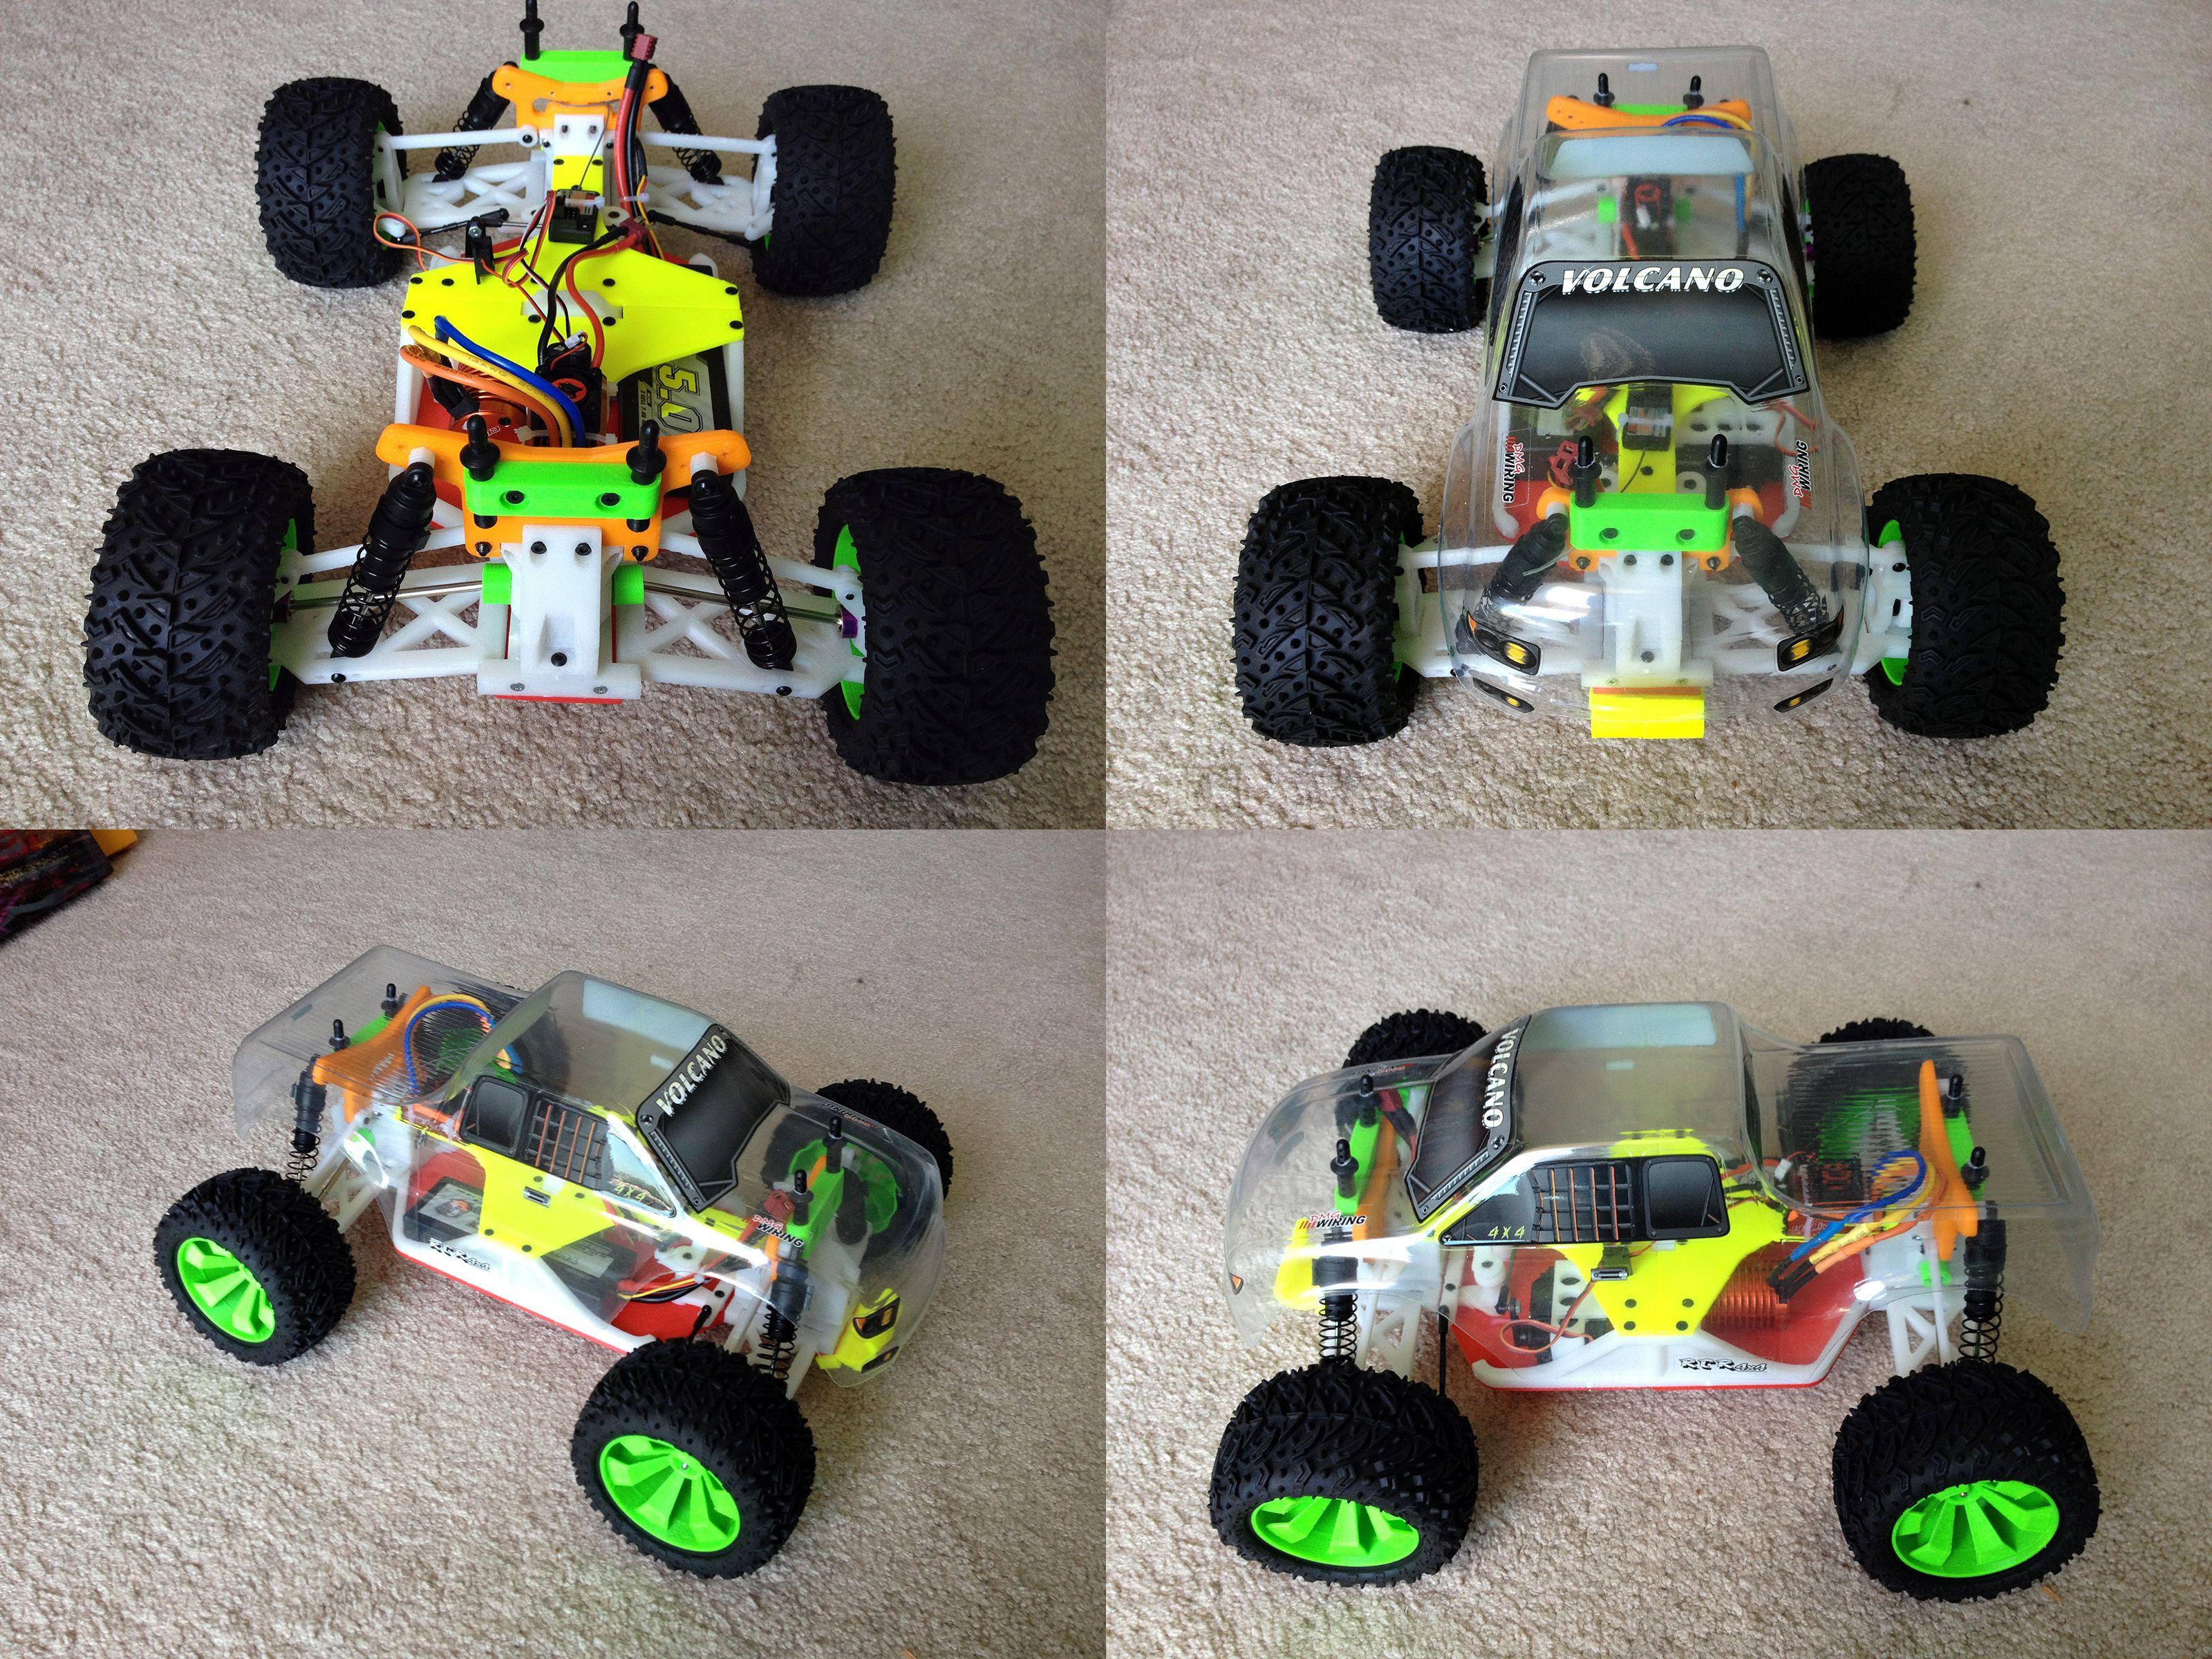 3d Printed Rc Car 3d Printed Objects Prints 3d Printing